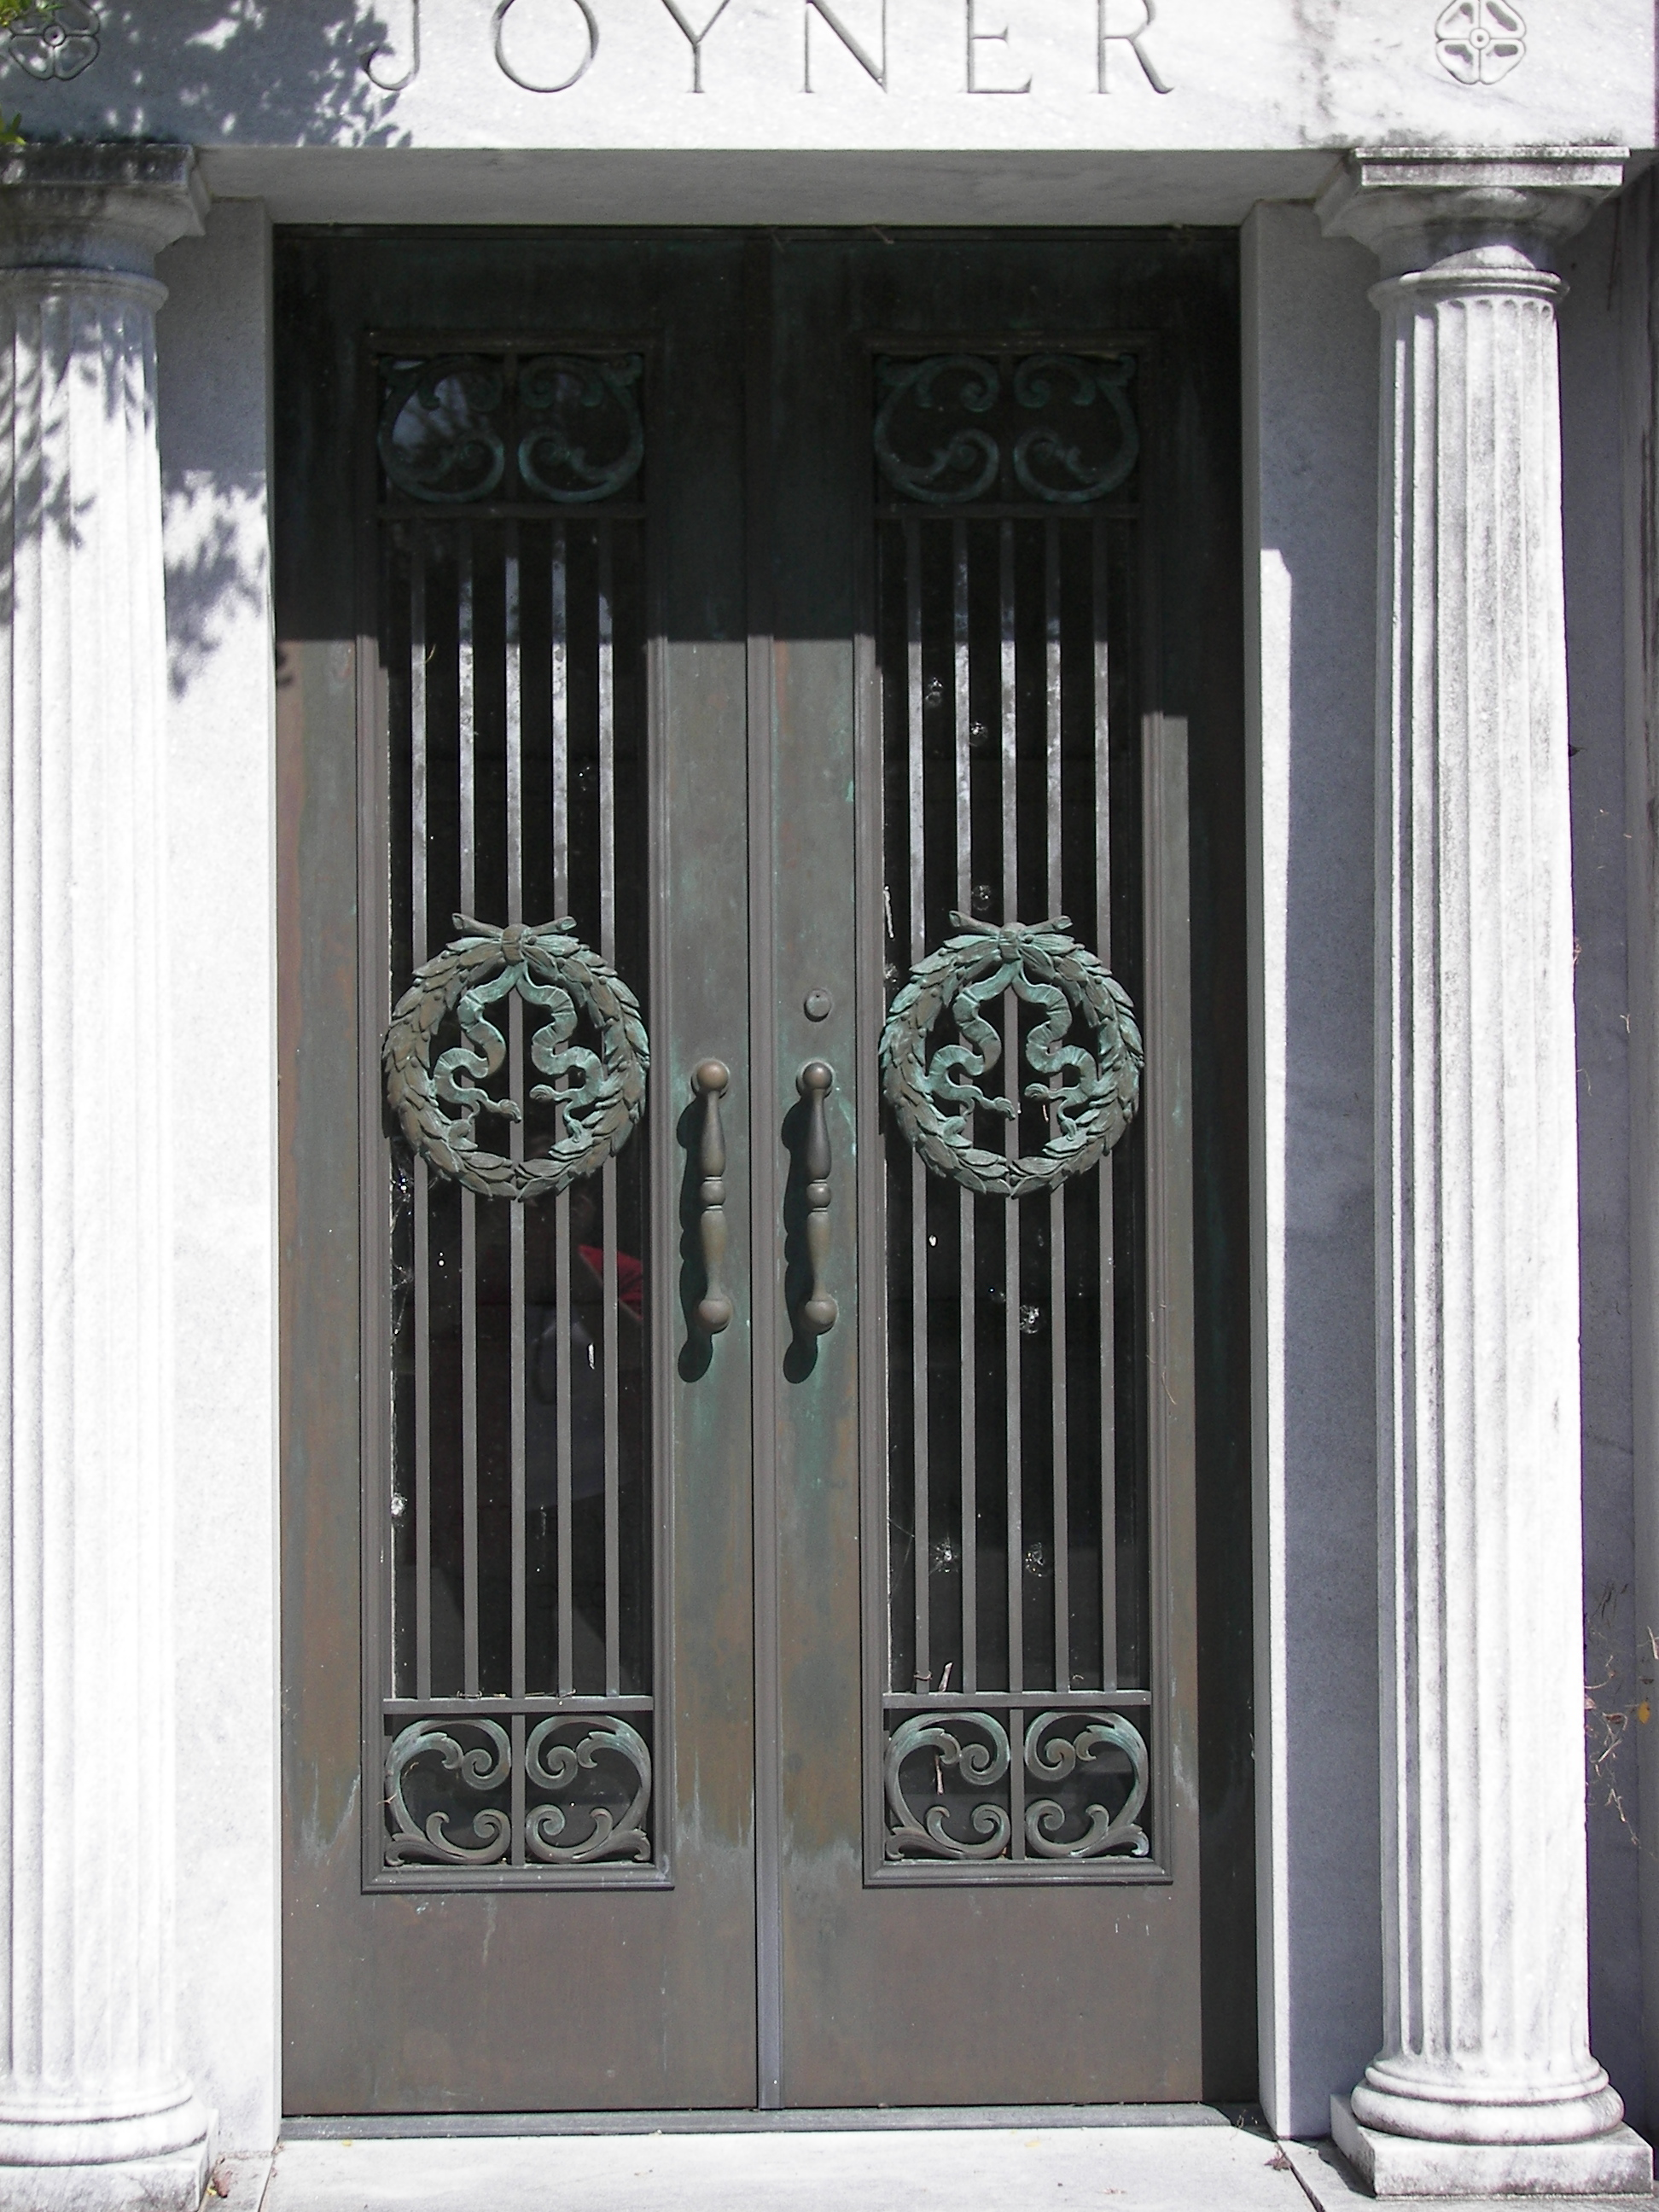 Mausoleum Doors 3 by seiyastock Mausoleum Doors 3 by seiyastock & Mausoleum Doors 3 by seiyastock on DeviantArt Pezcame.Com